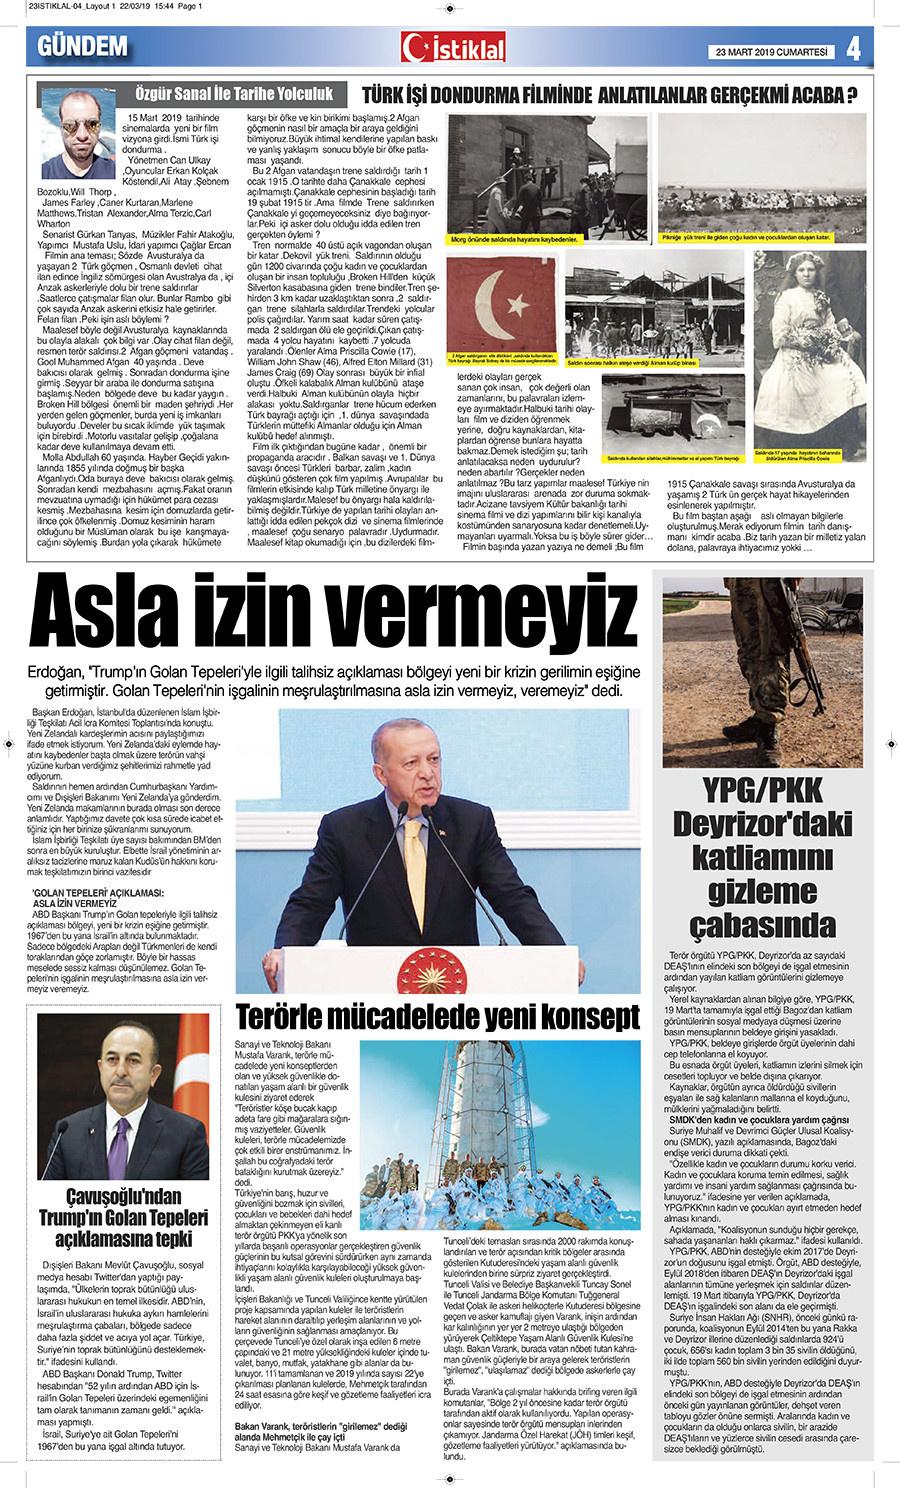 İstiklal Gazetesi 4'nci Sayfa